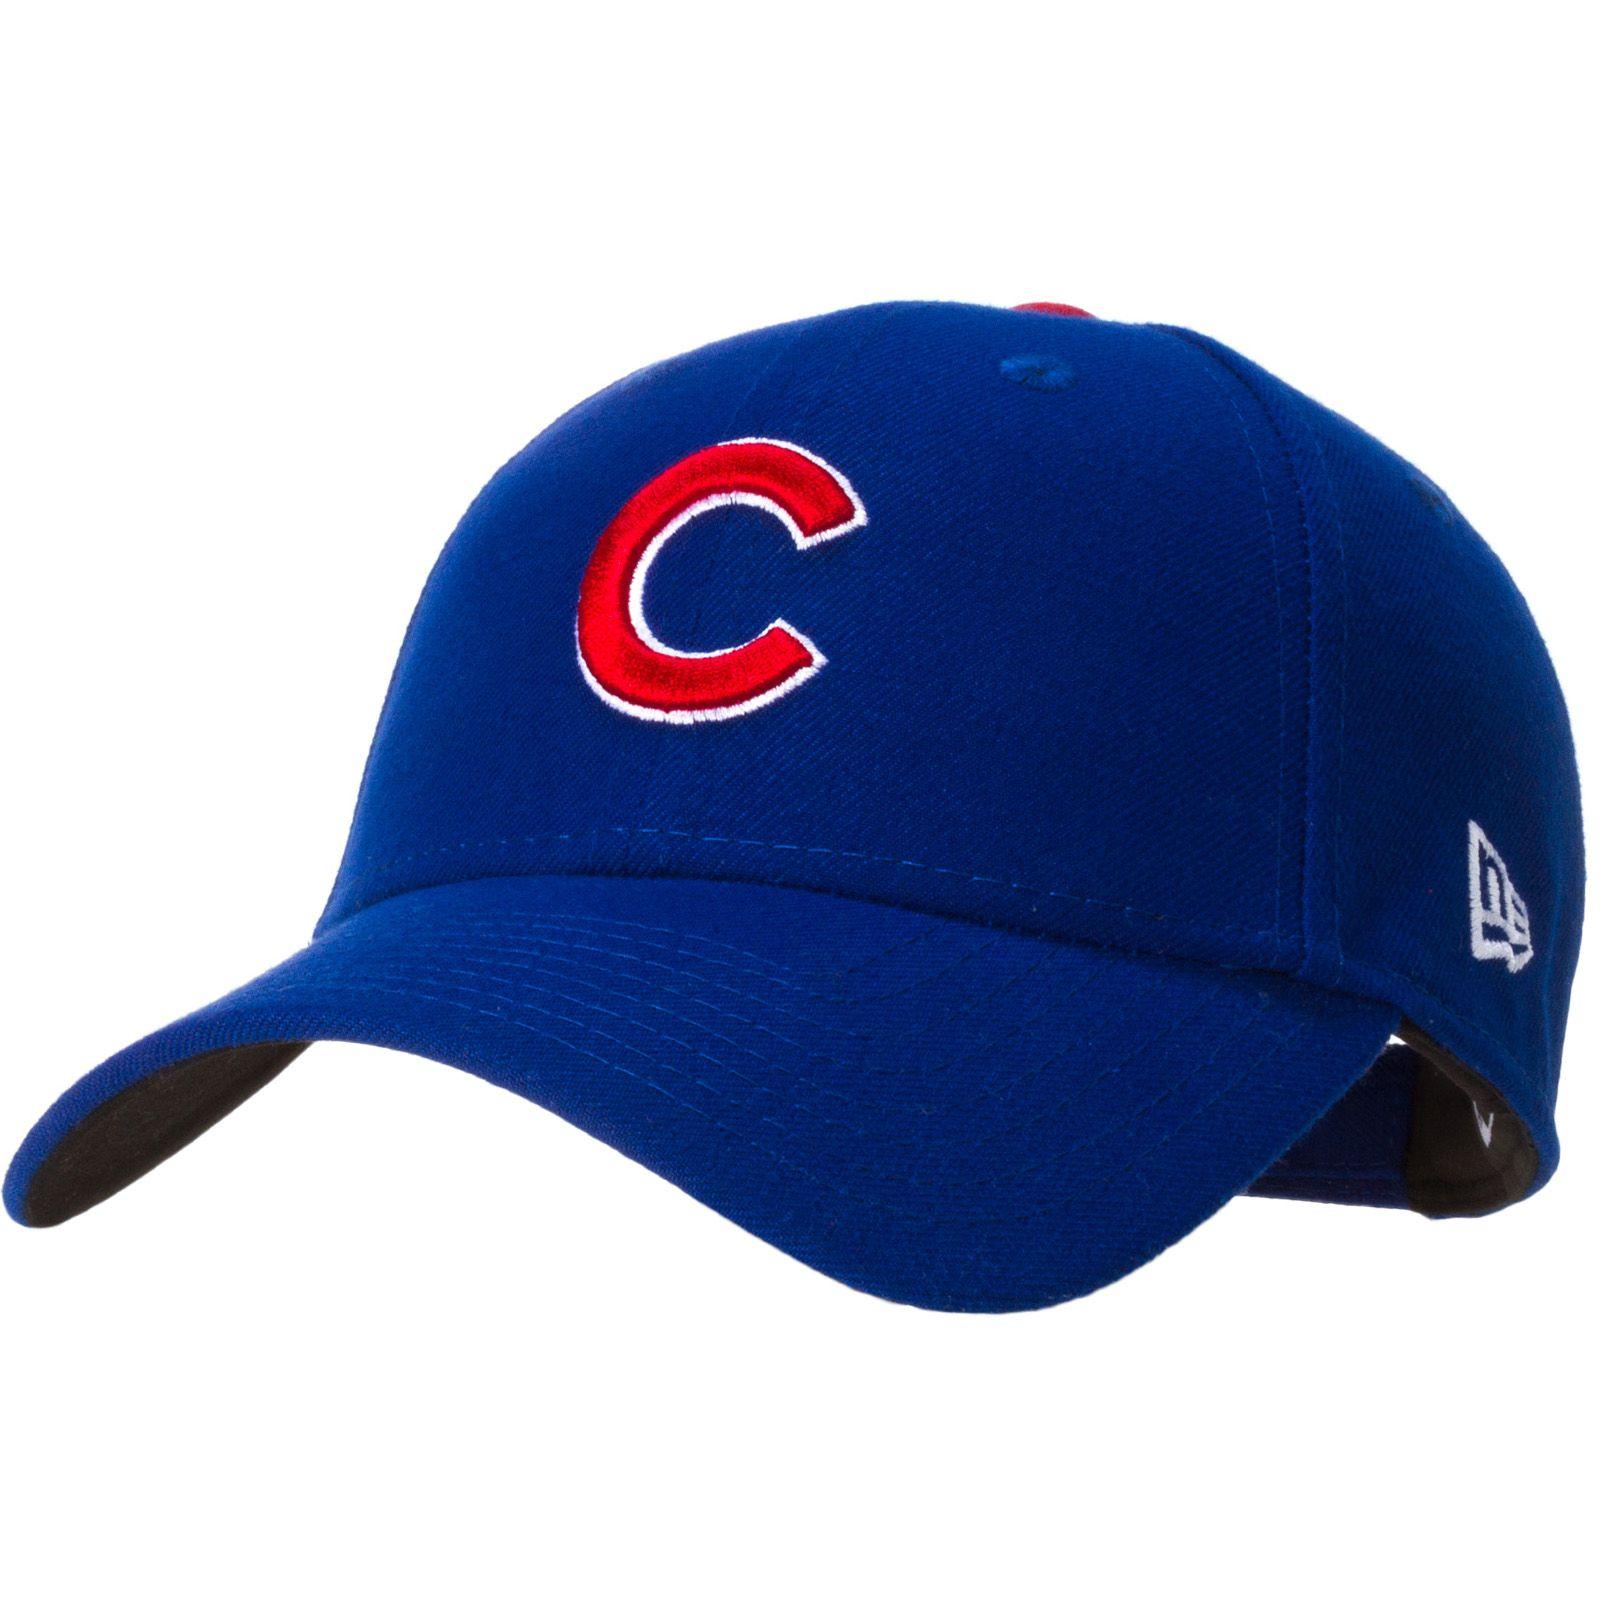 8caf6a9e36d Chicago Cubs Adjustable Light Royal Hat with